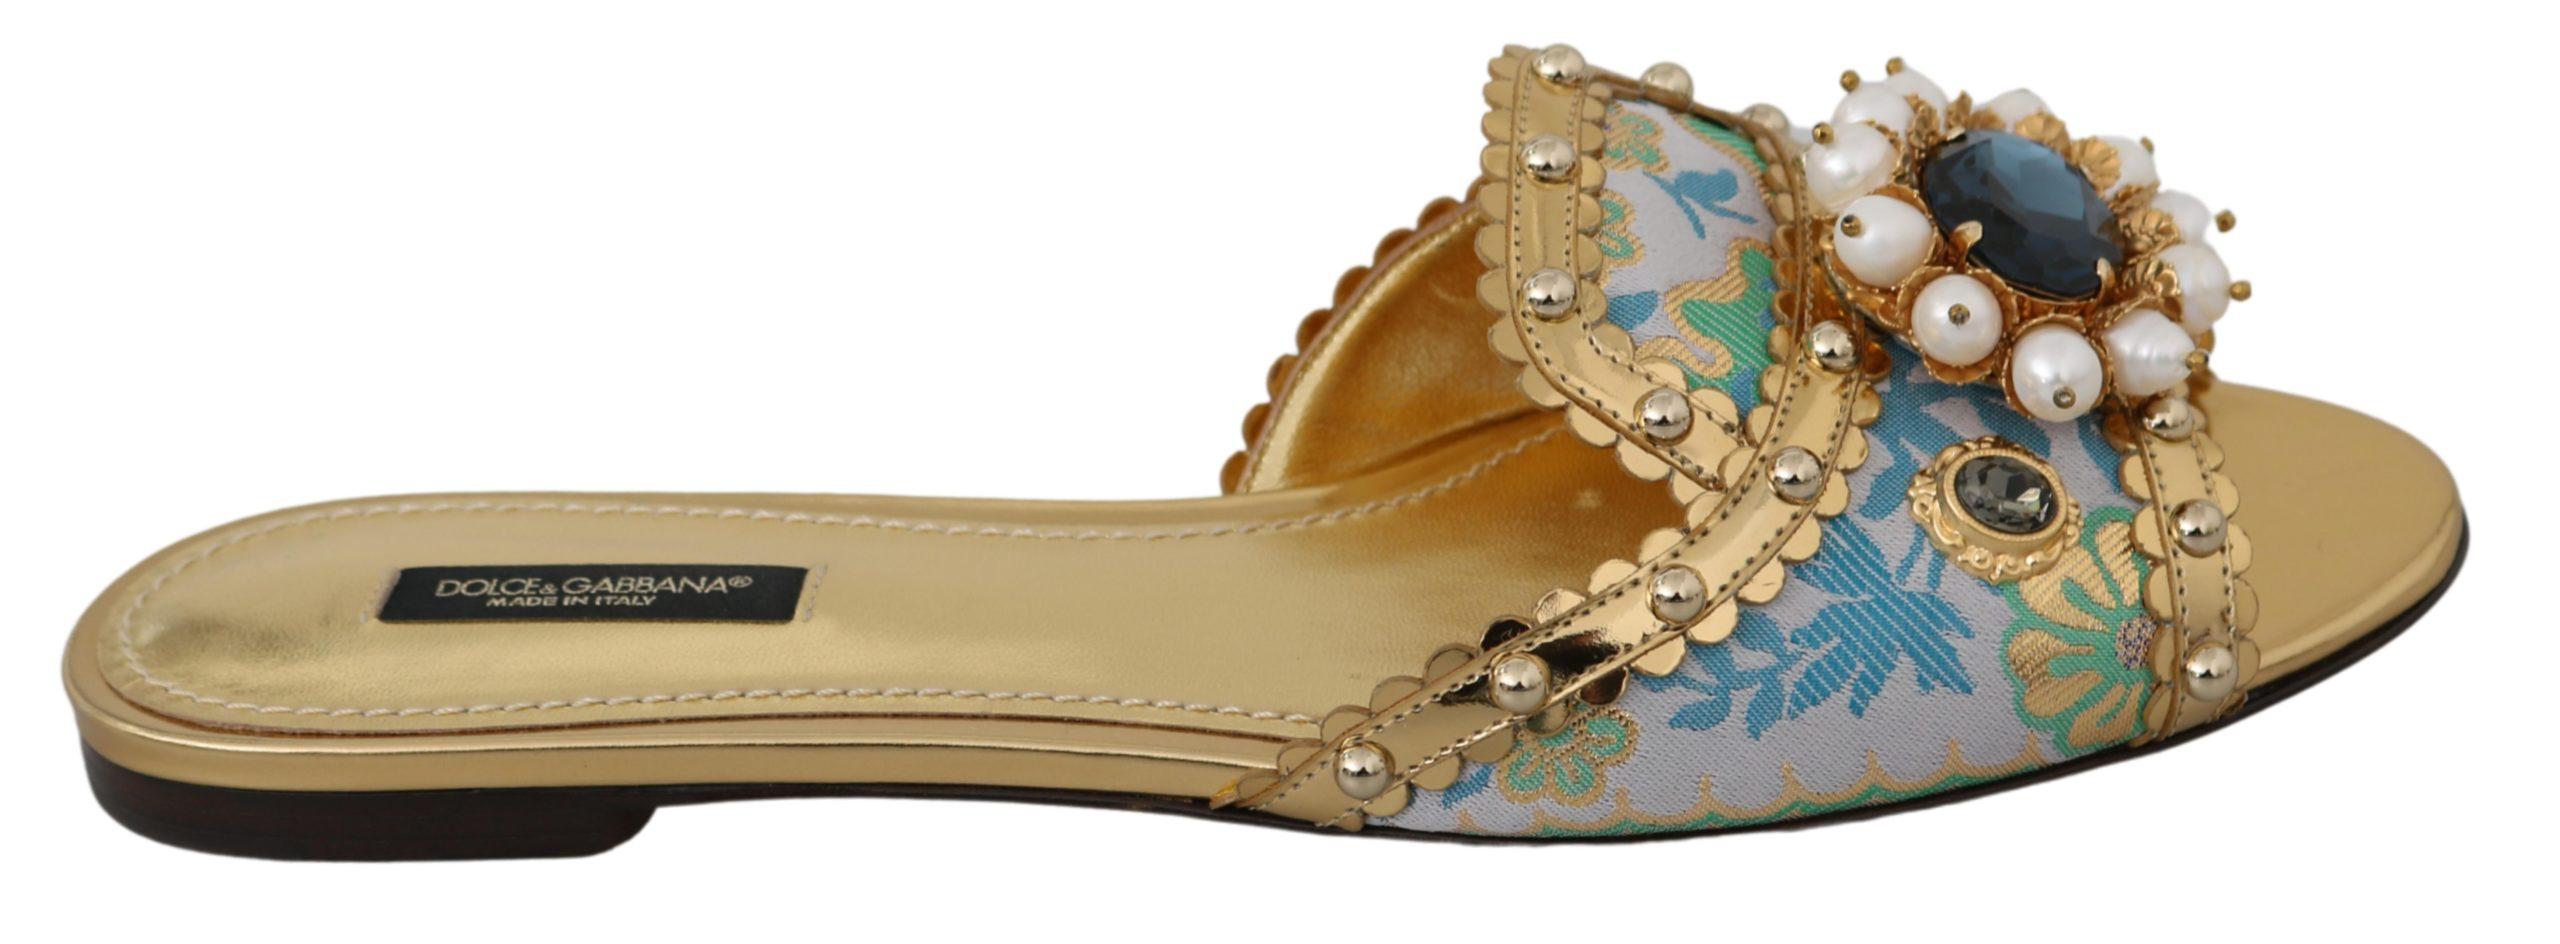 Dolce & Gabbana Women's Crystal Slides Flat Gold LA6554 - EU36/US5.5